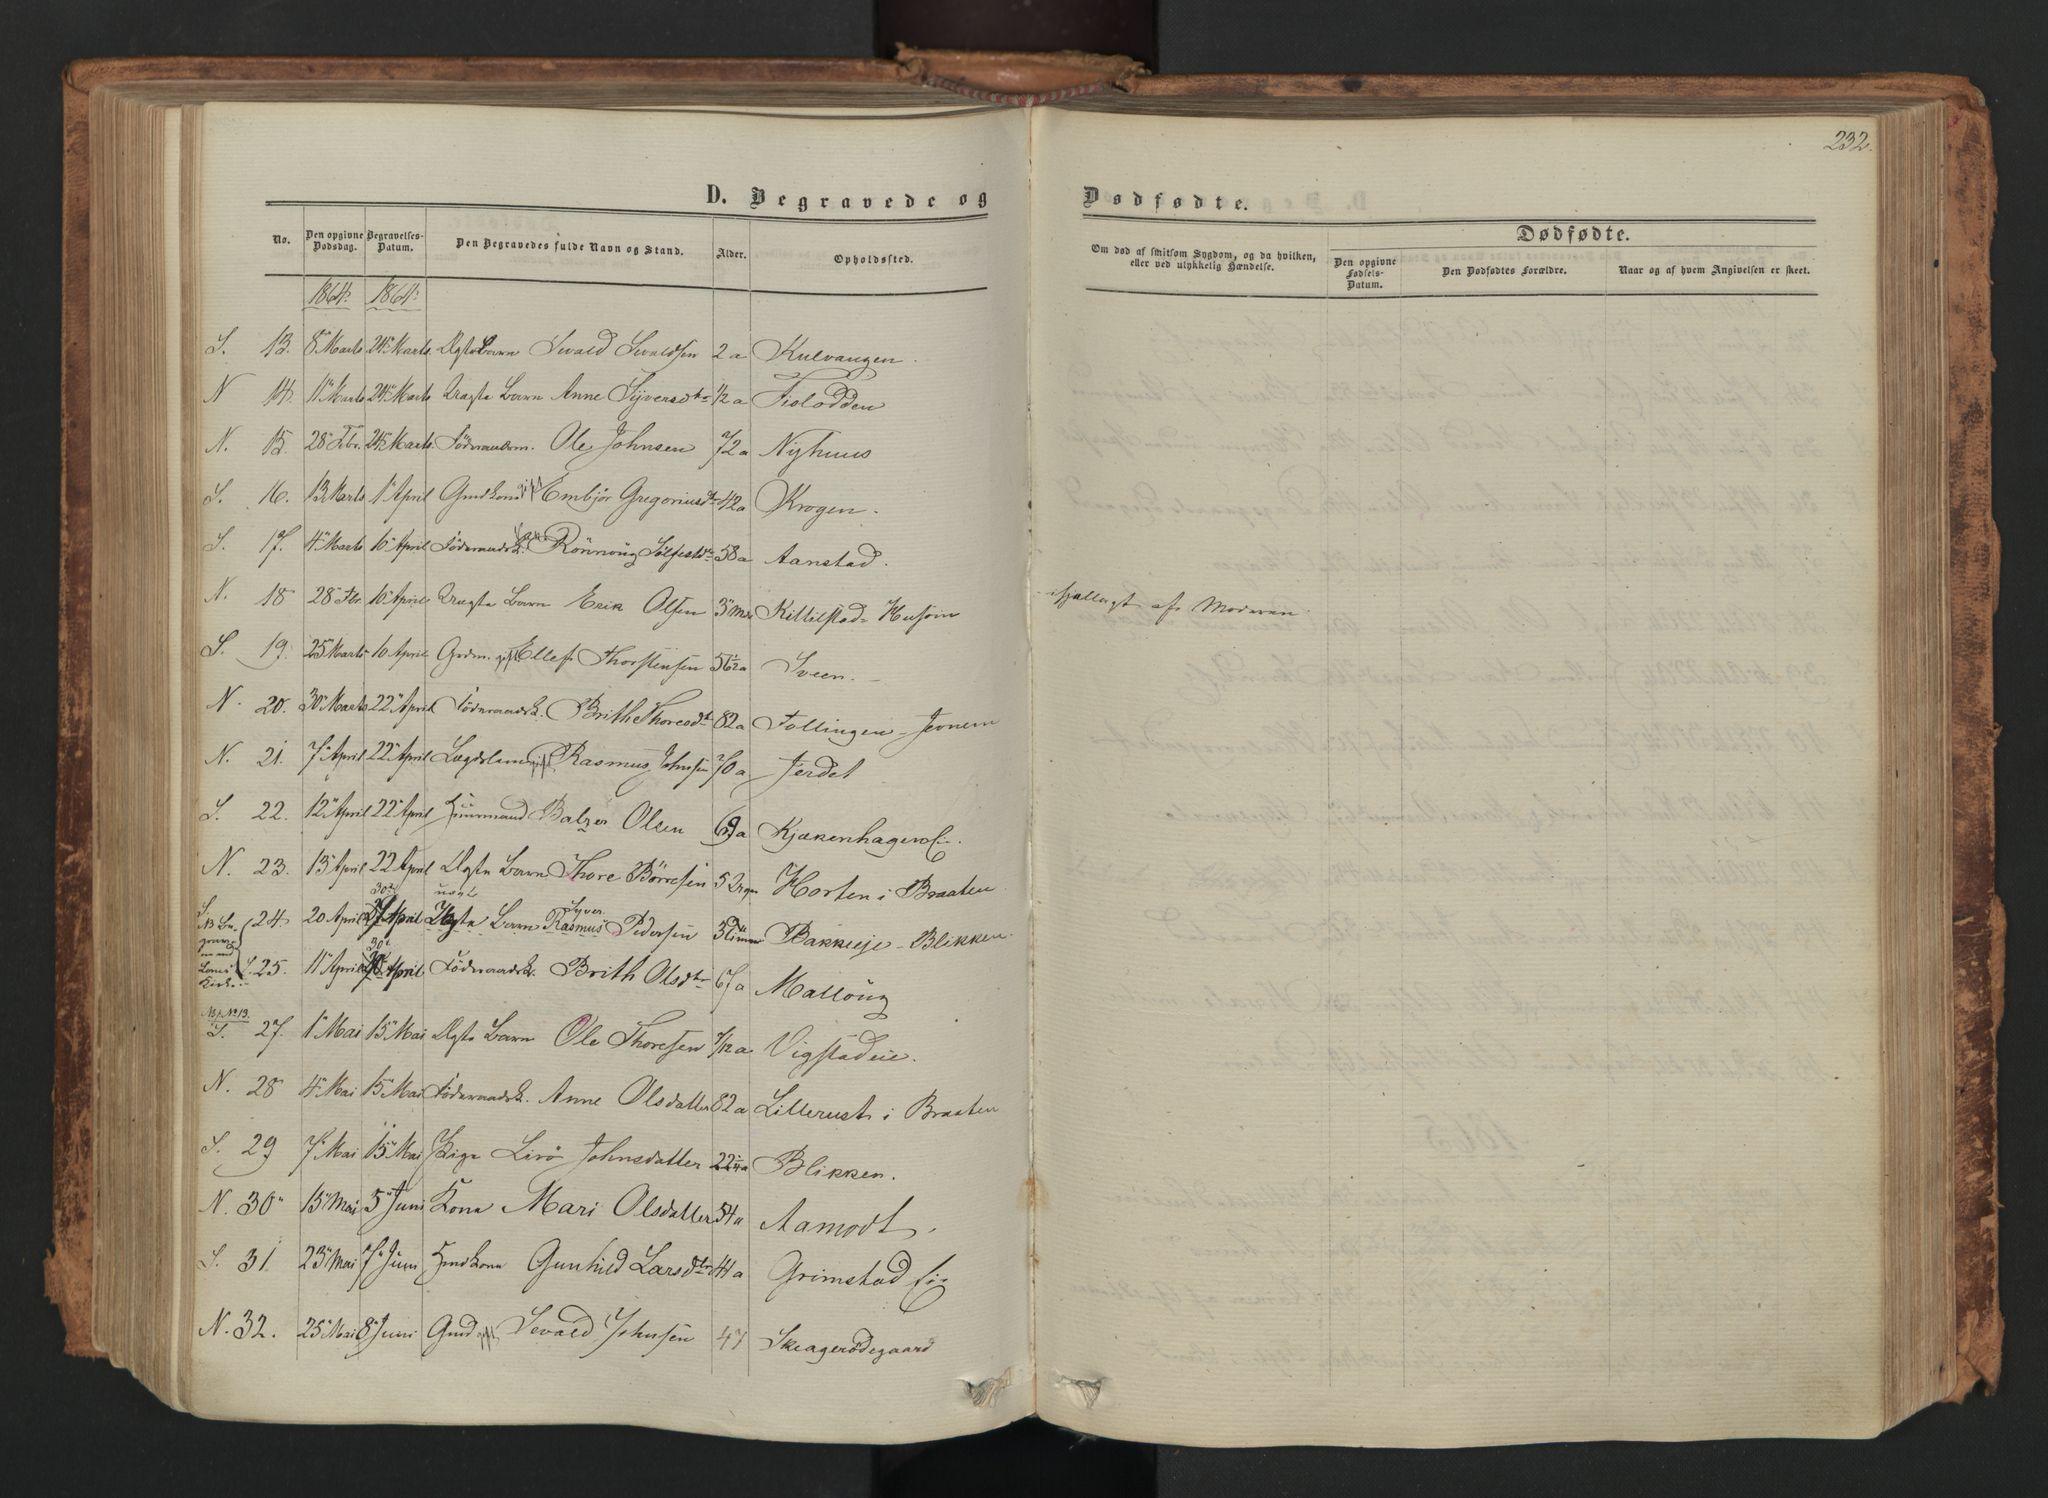 SAH, Skjåk prestekontor, Ministerialbok nr. 1, 1863-1879, s. 232